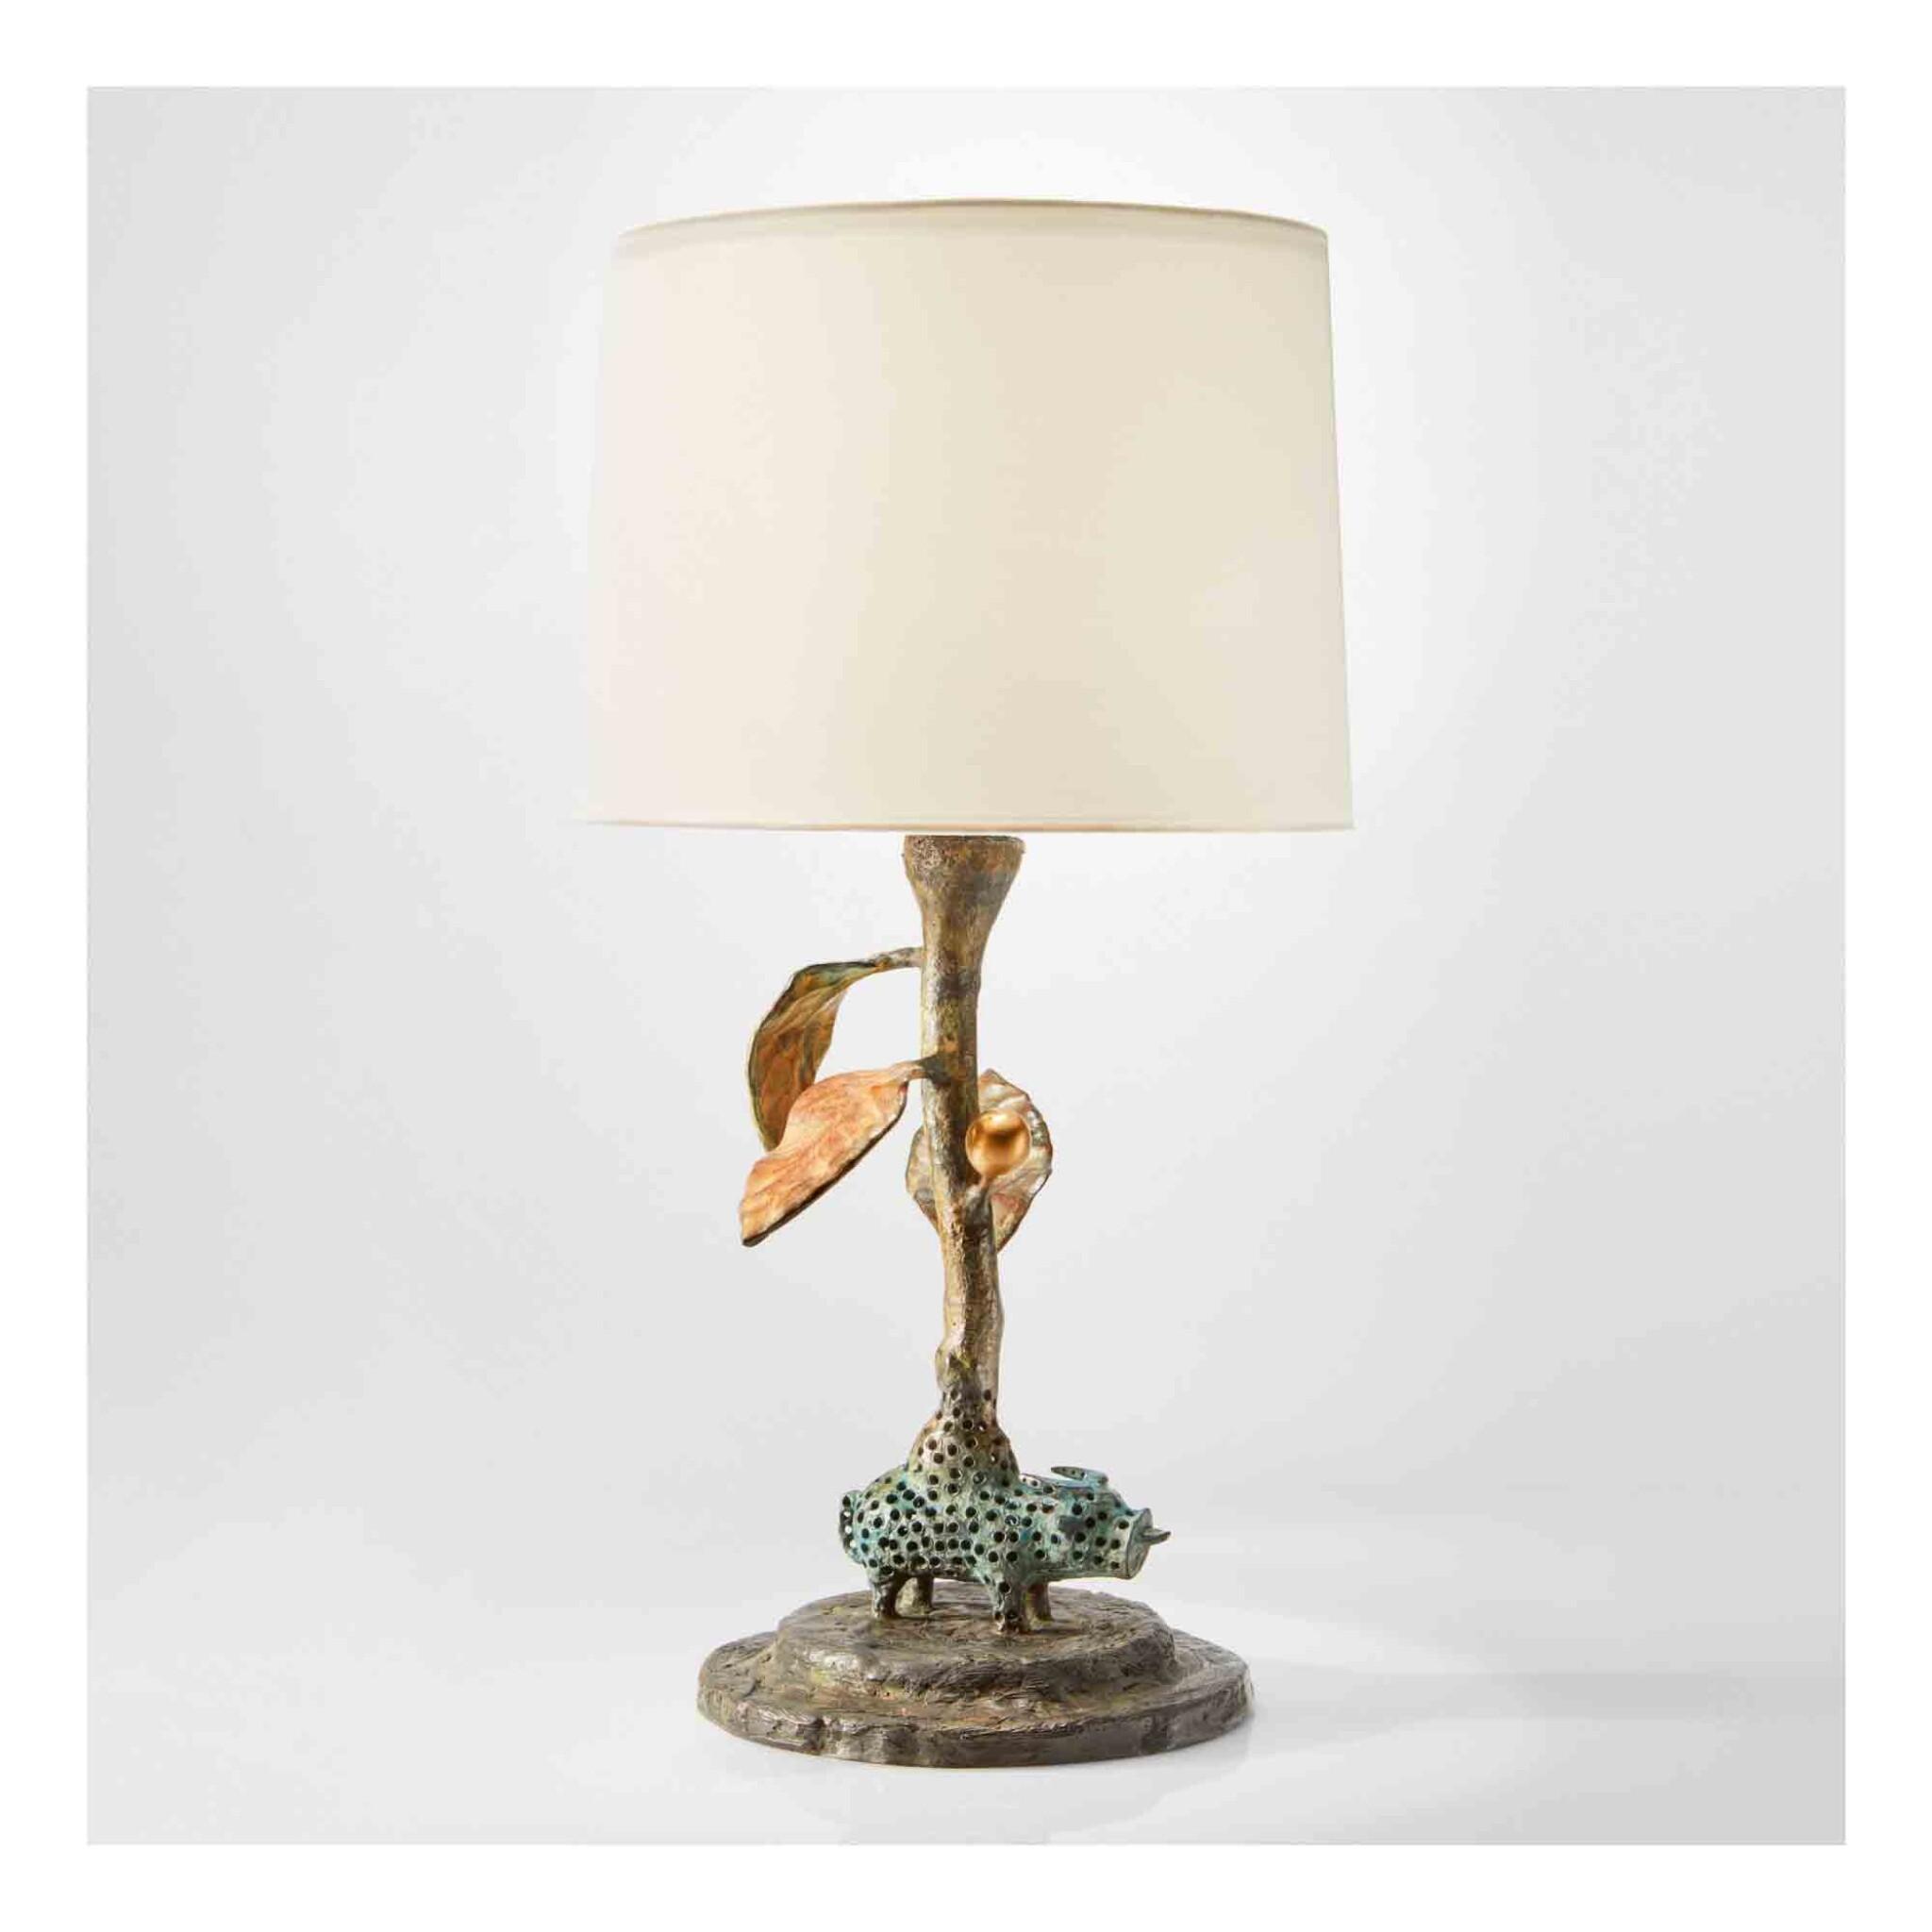 "View 1 of Lot 449. ""Night Spirit"" Table Lamp."